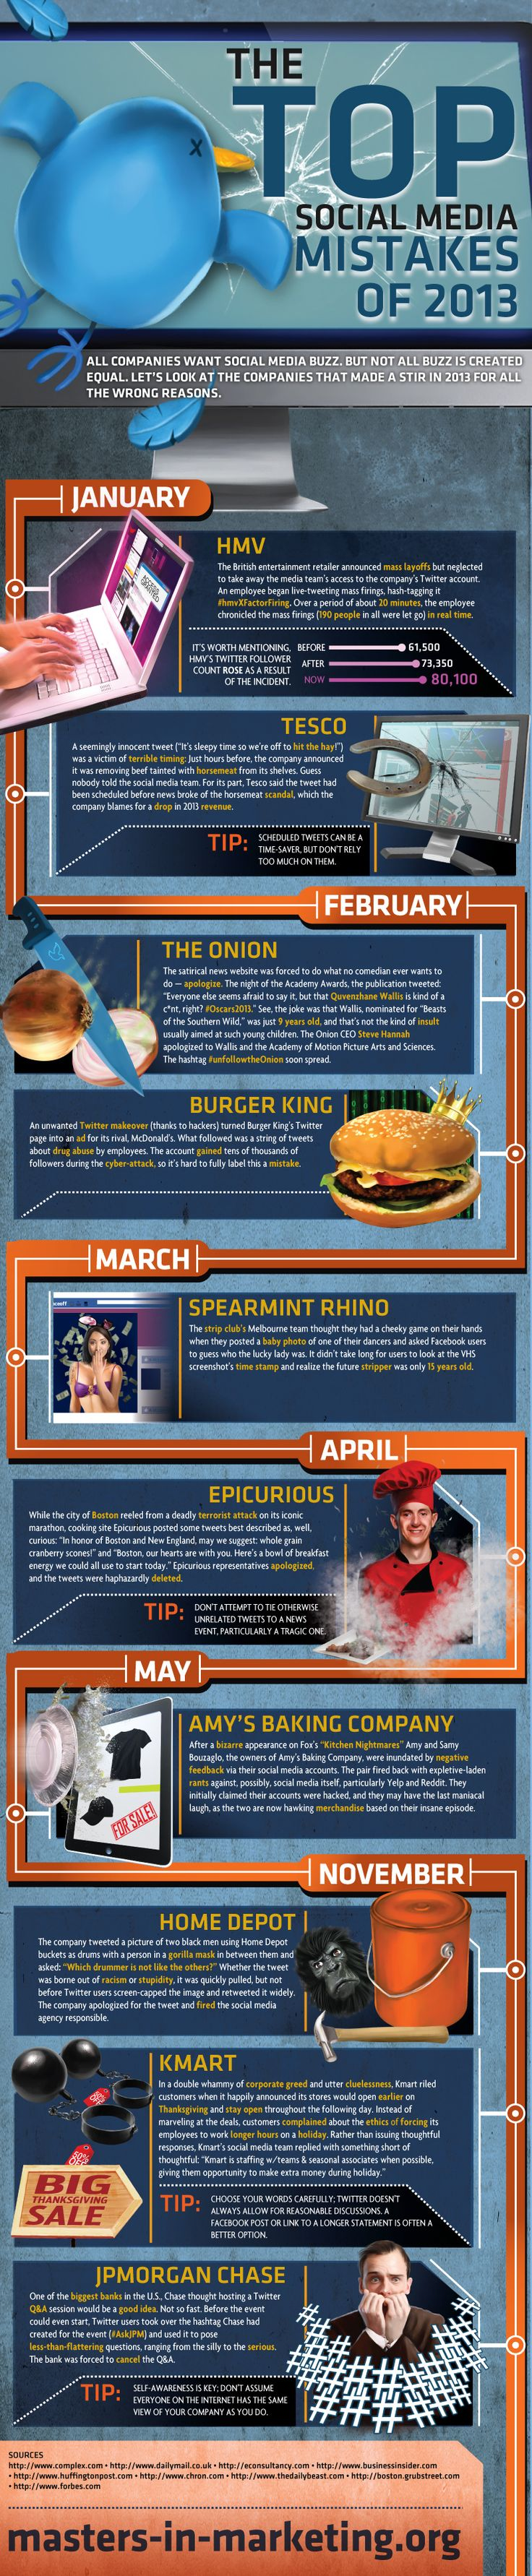 The Top Social Media Mistakes Of 2013   #Infographic #SocialMedia #Mistakes